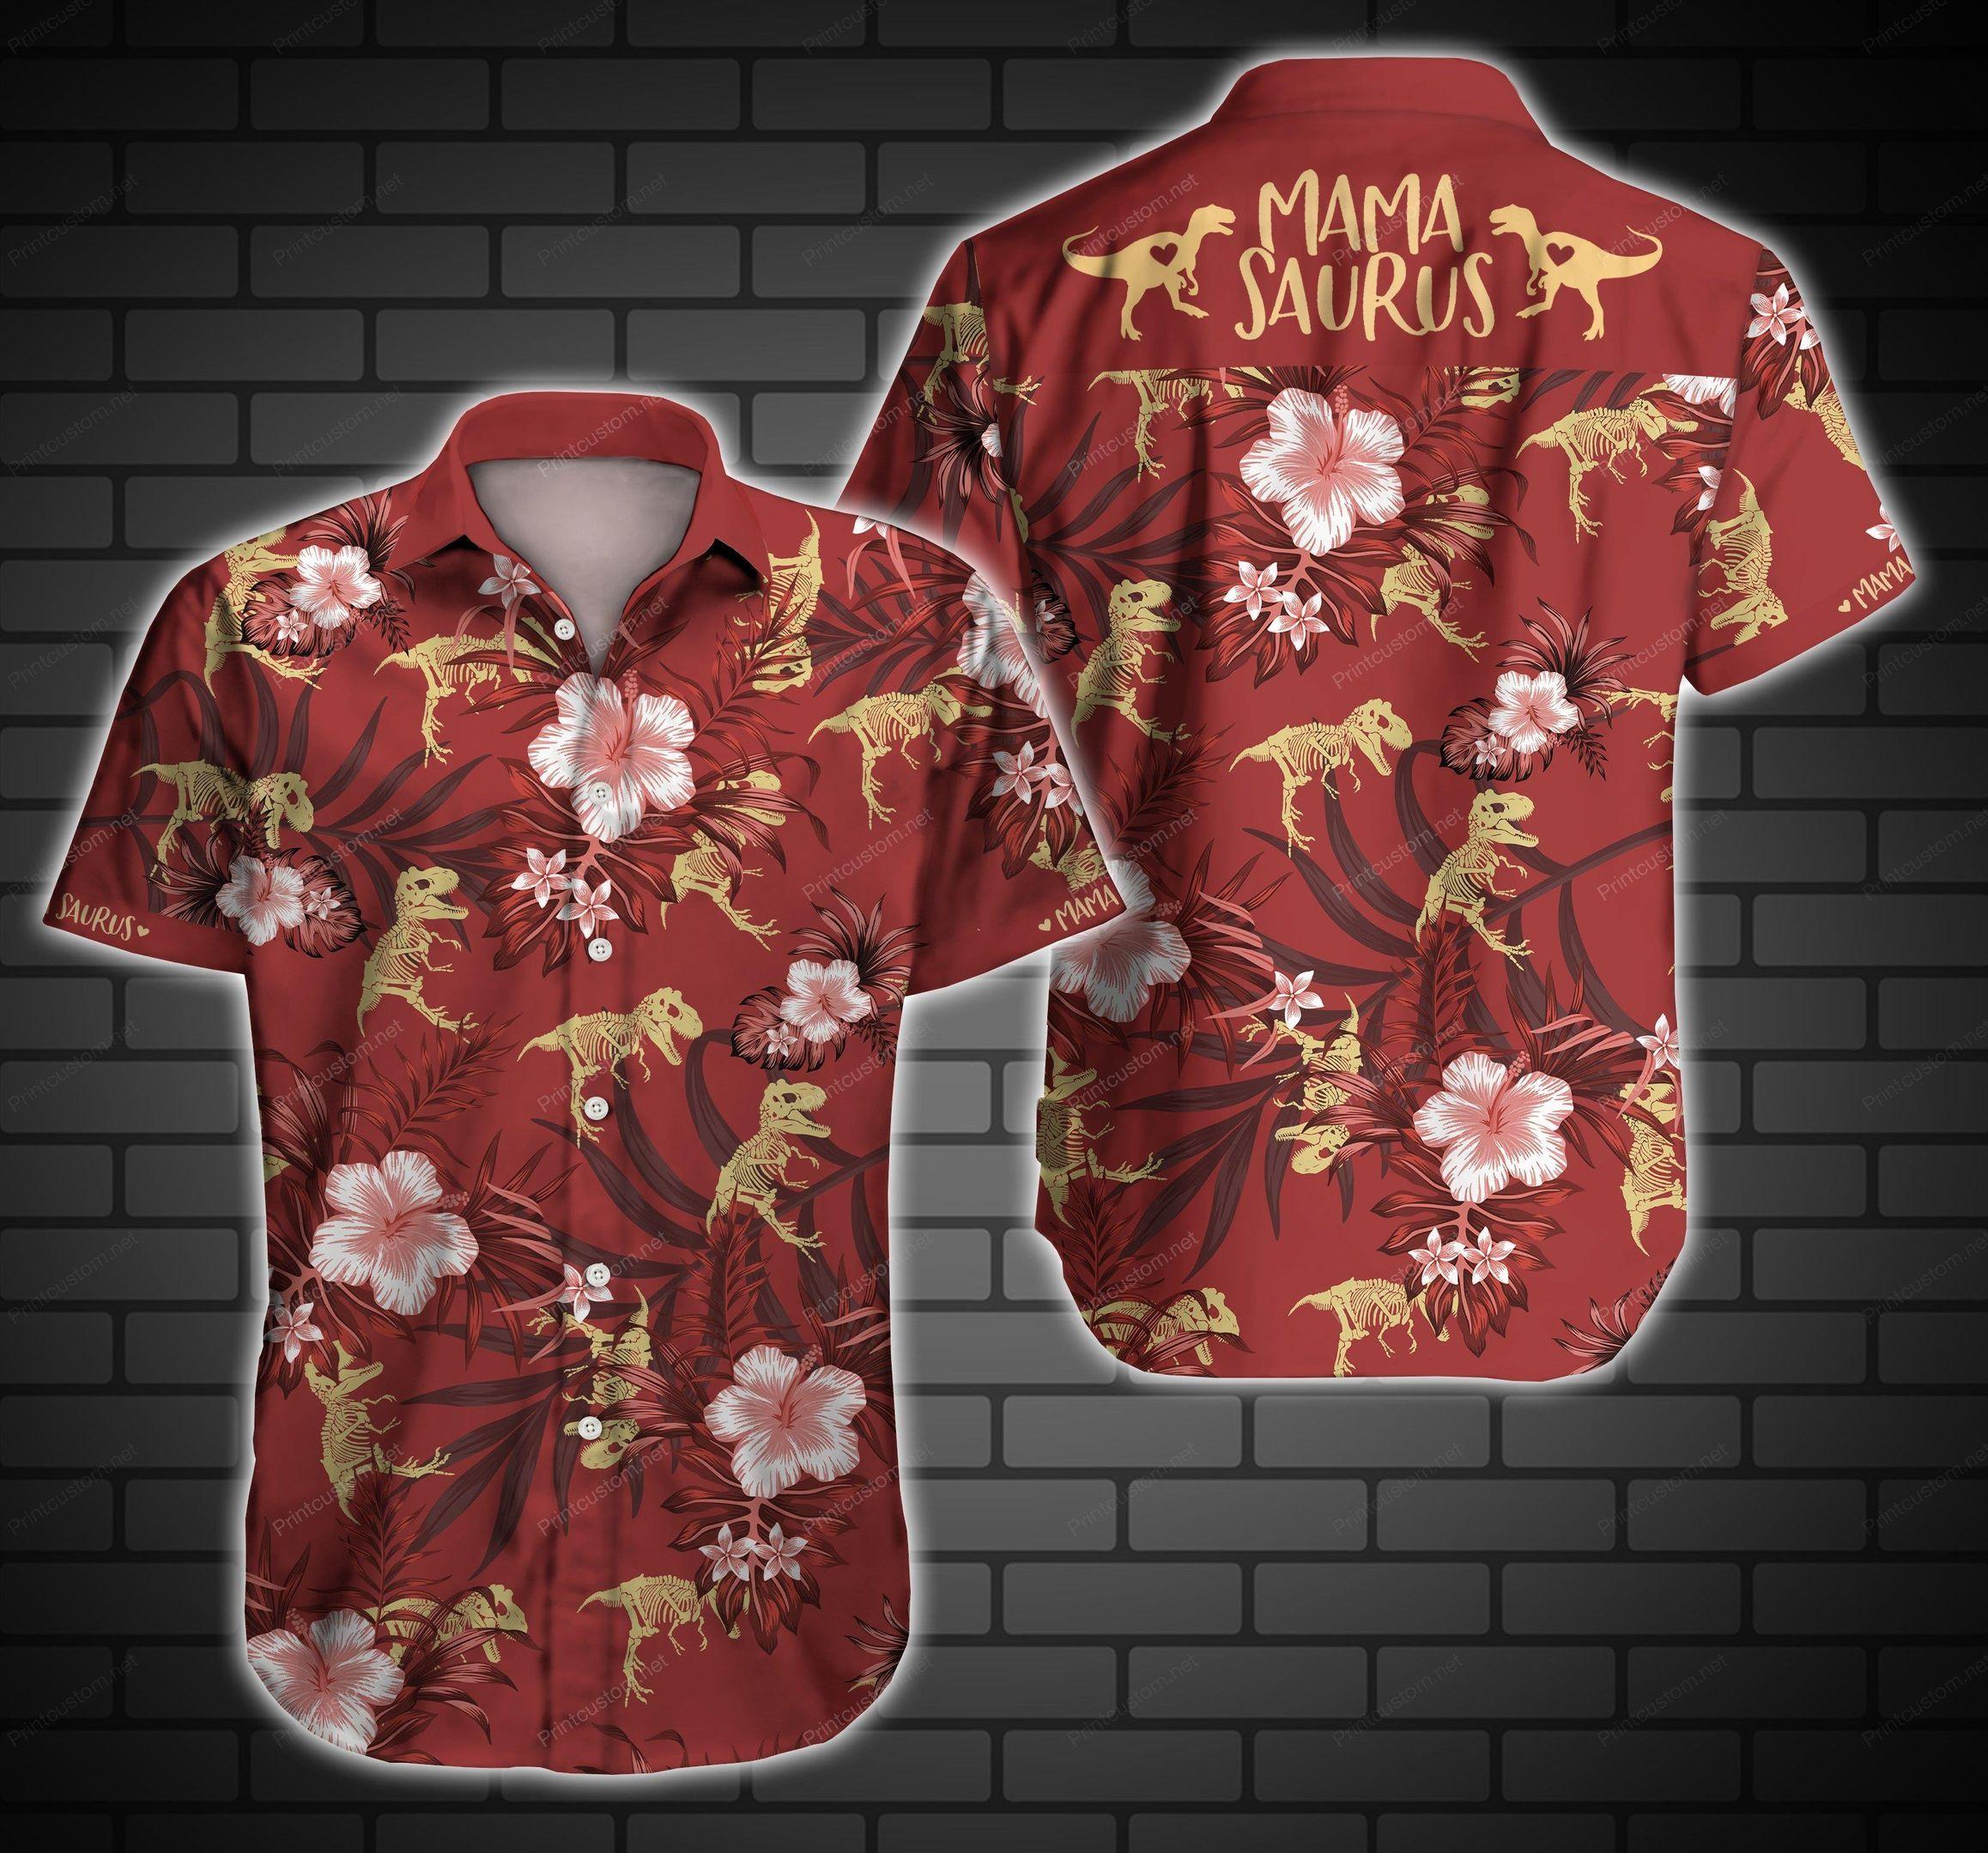 Mamasaurus Red Hawaii Shirt Summer Beach Wear